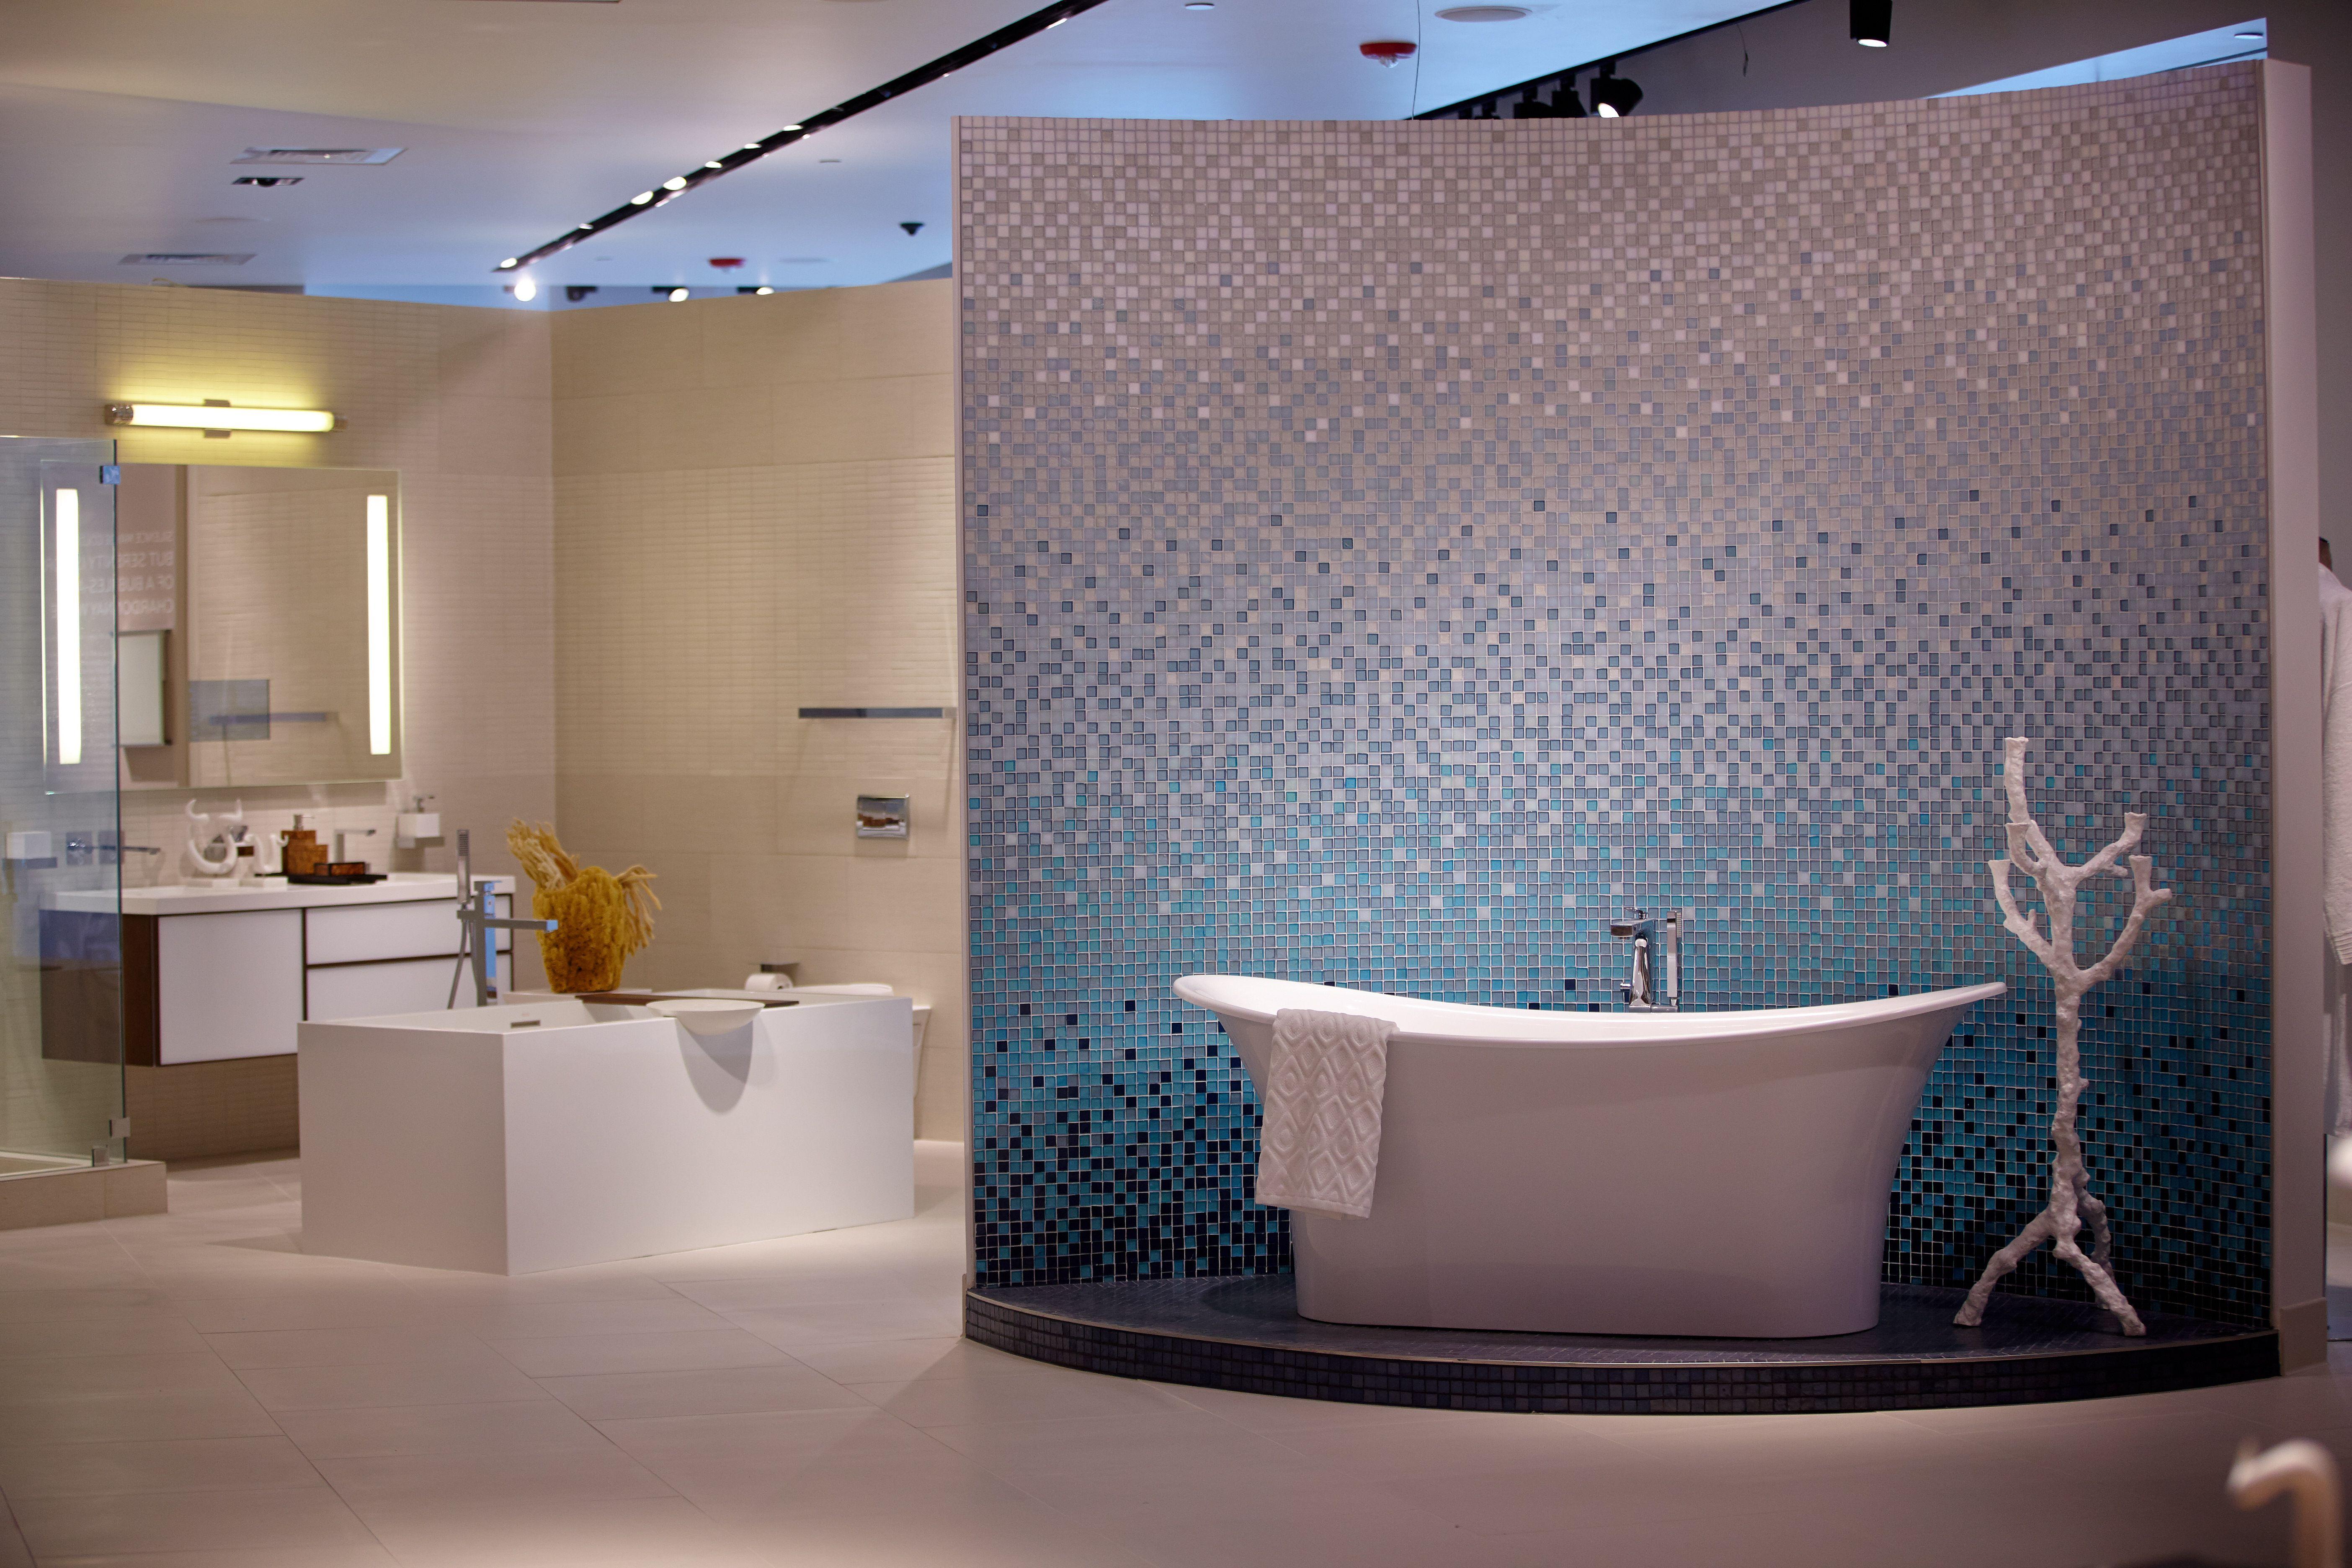 Gorgeous Bath Vignette Featuring Oceanside Glasstile In PIRCH - Bathroom design showroom chicago